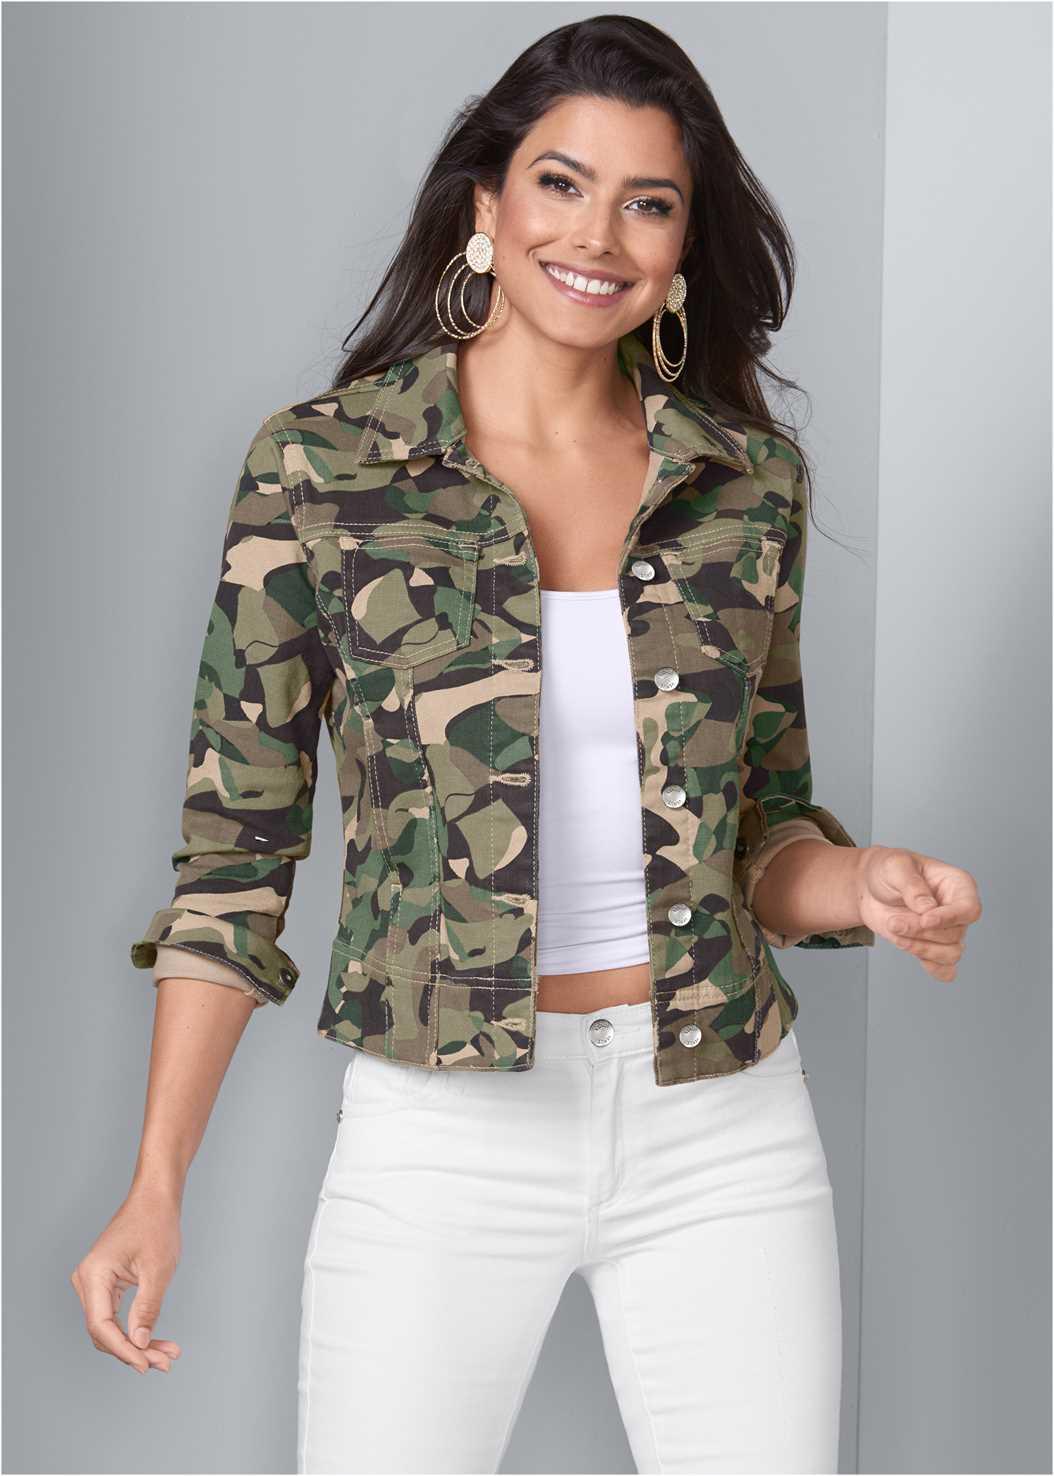 Jean Jacket,Basic Cami Two Pack,Color Capri Jeans